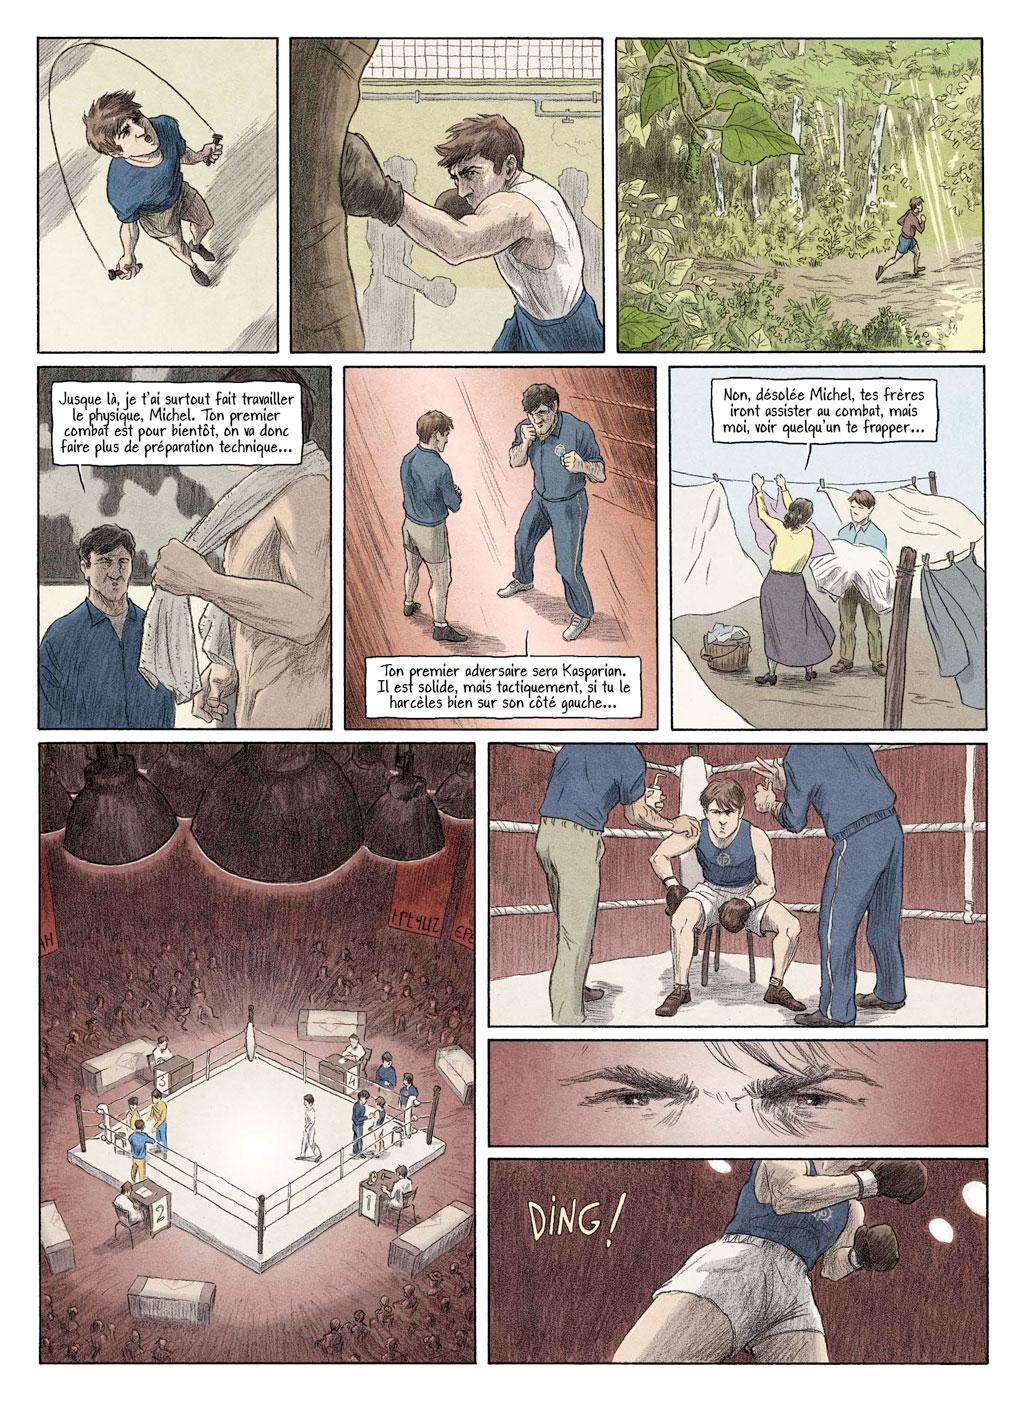 199 Combats - p.24